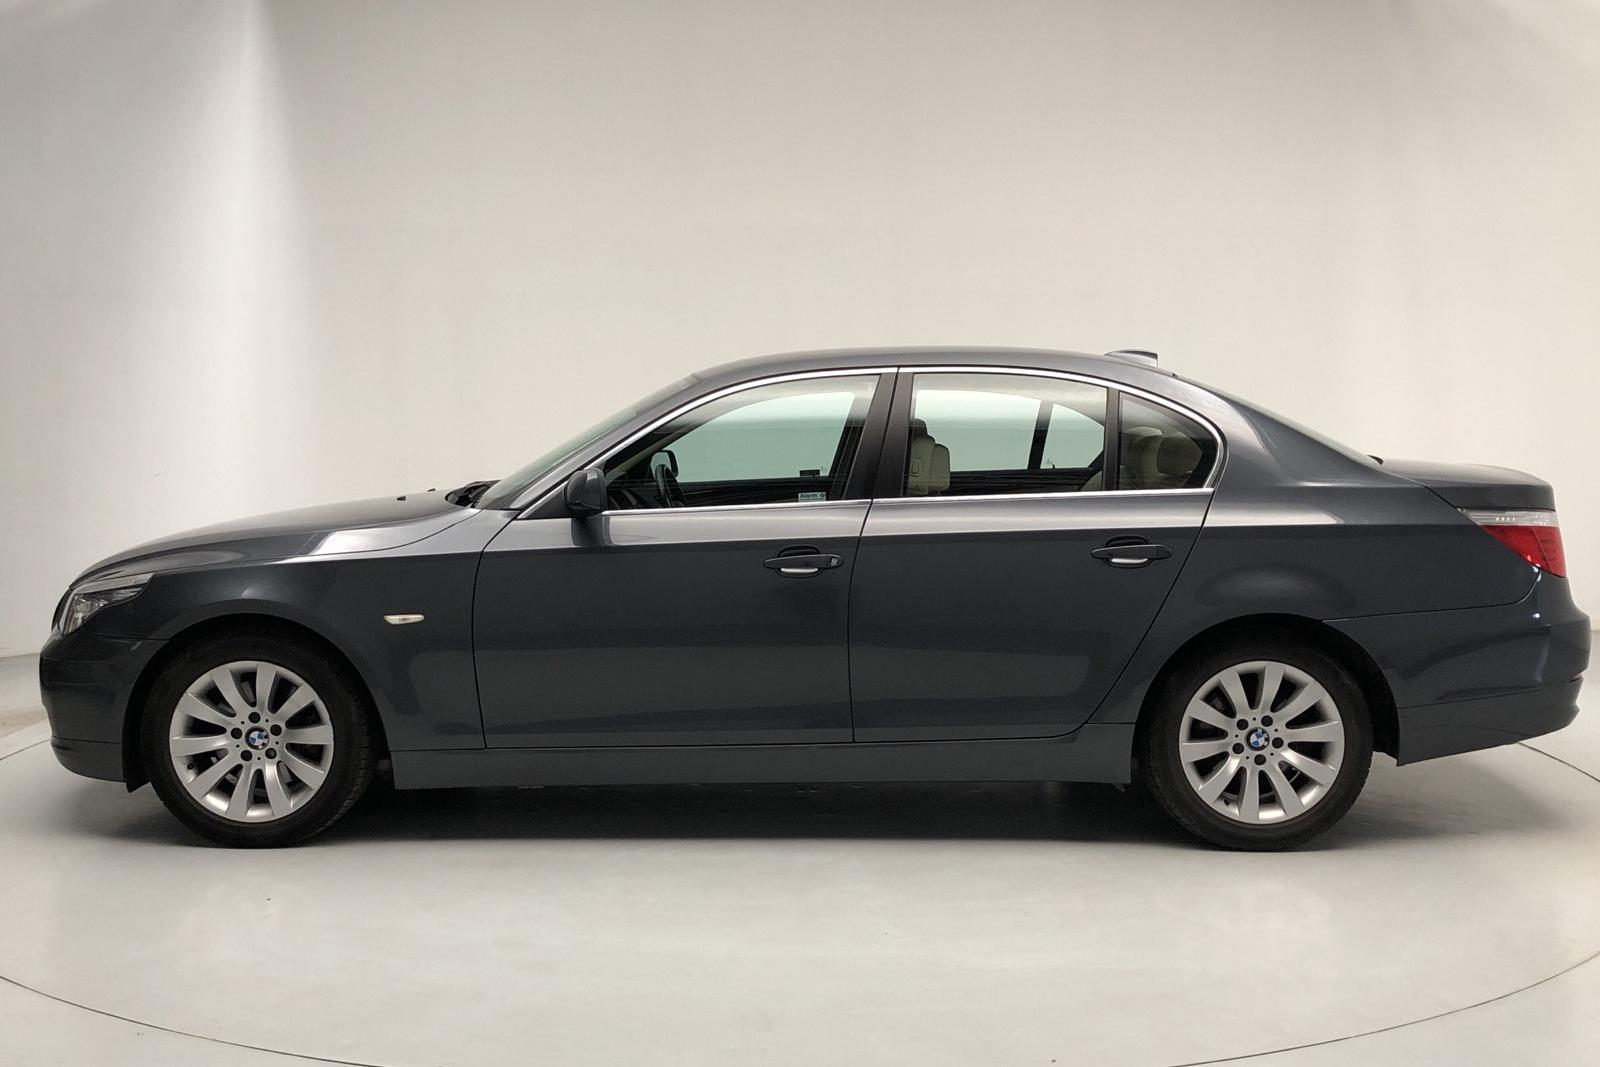 BMW 520d Sedan, E60 (177hk) - 10 800 mil - Manuell - grå - 2009